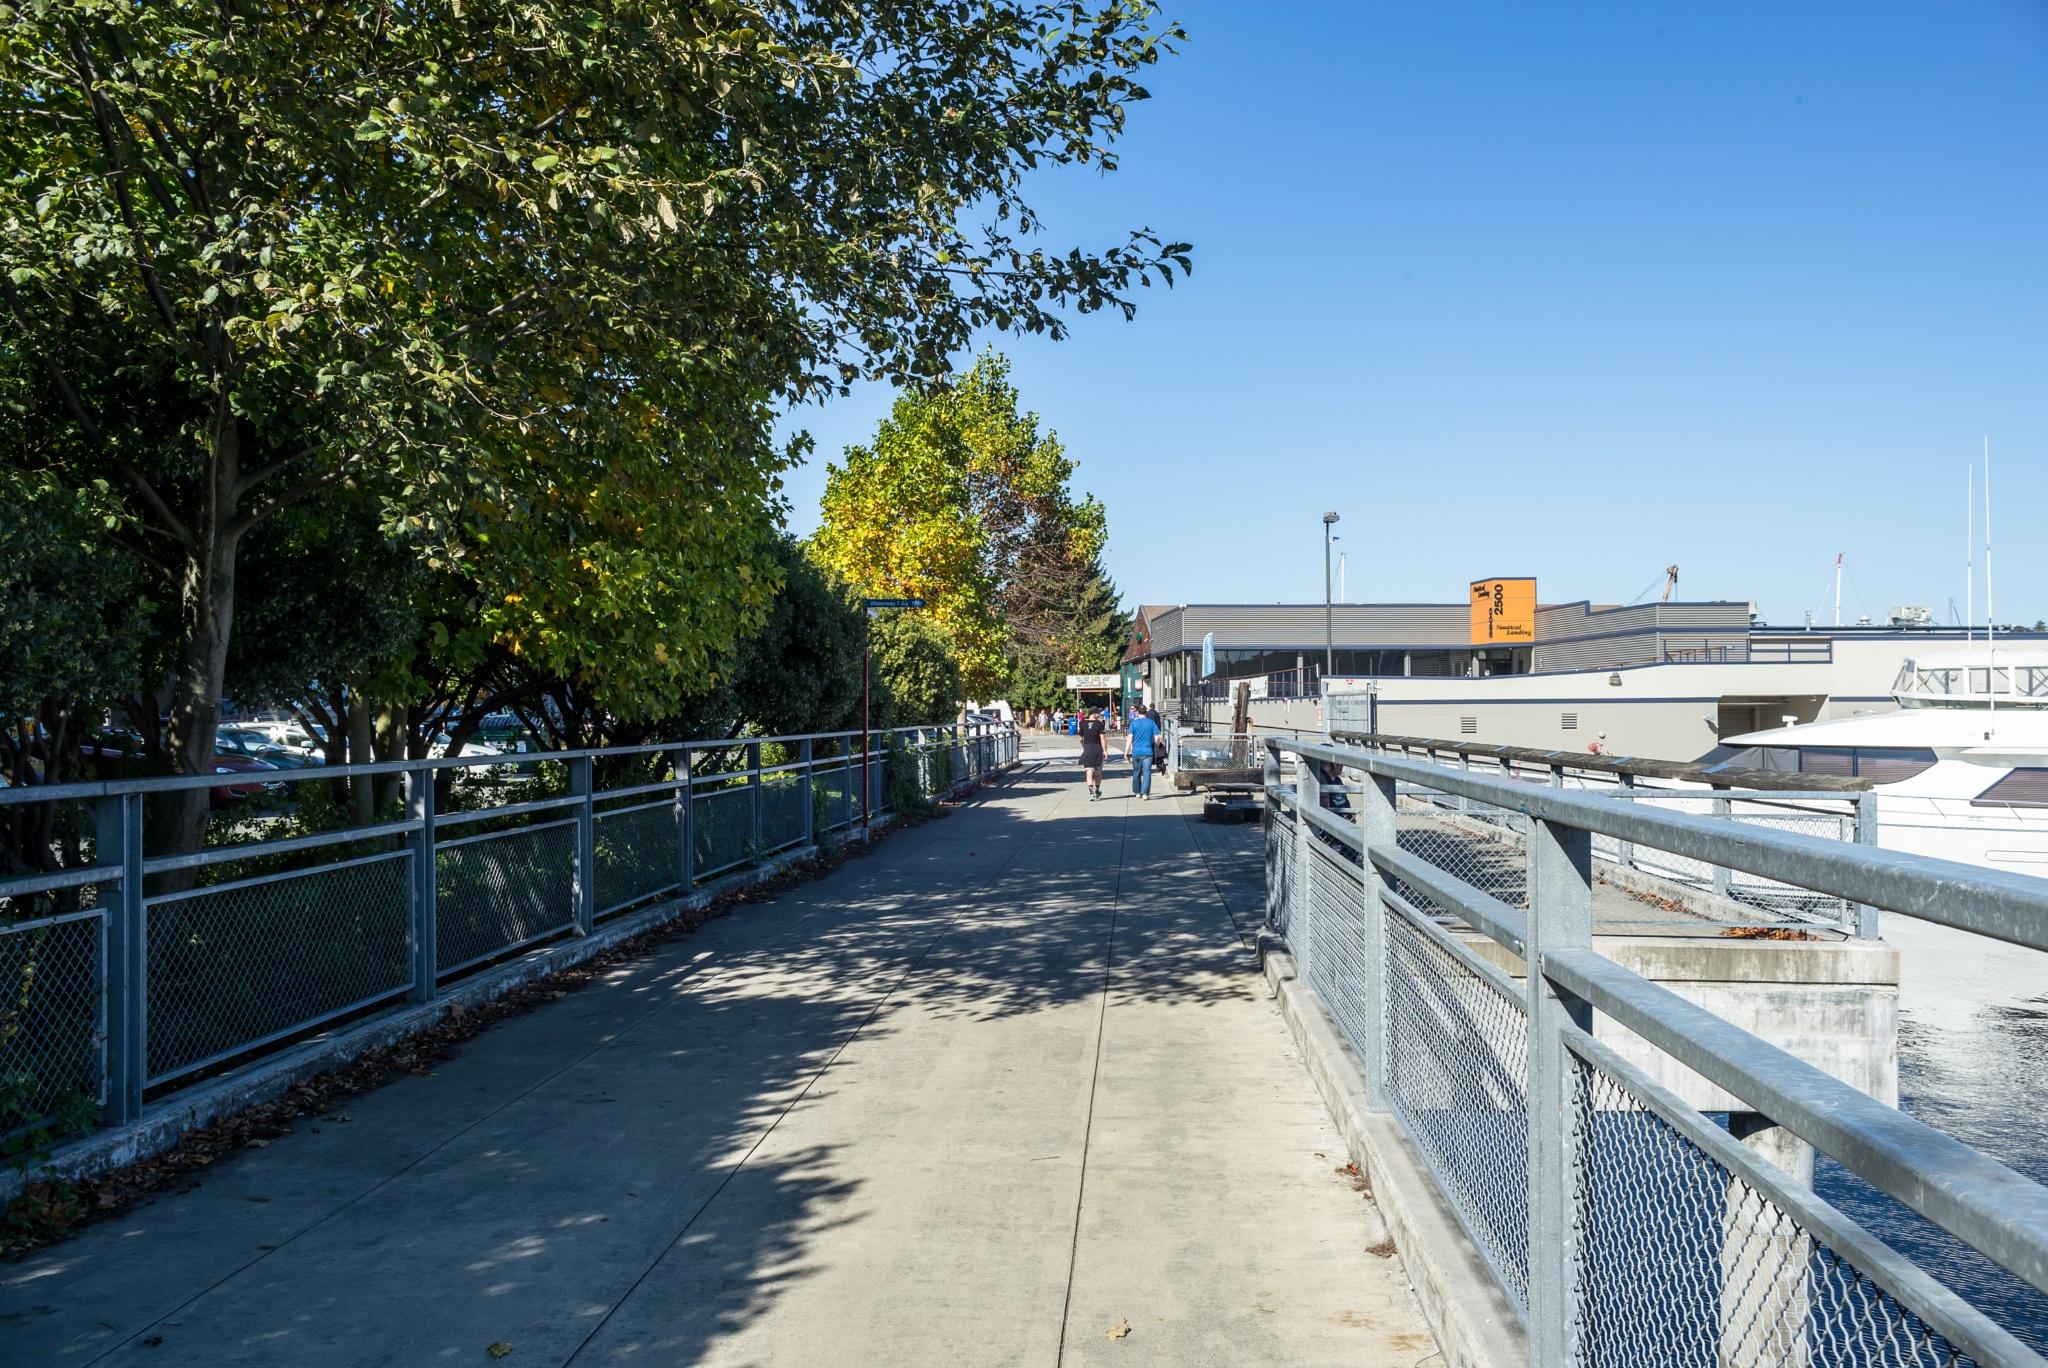 Walking along Lake Union - Seattle by Stephen C. Benine